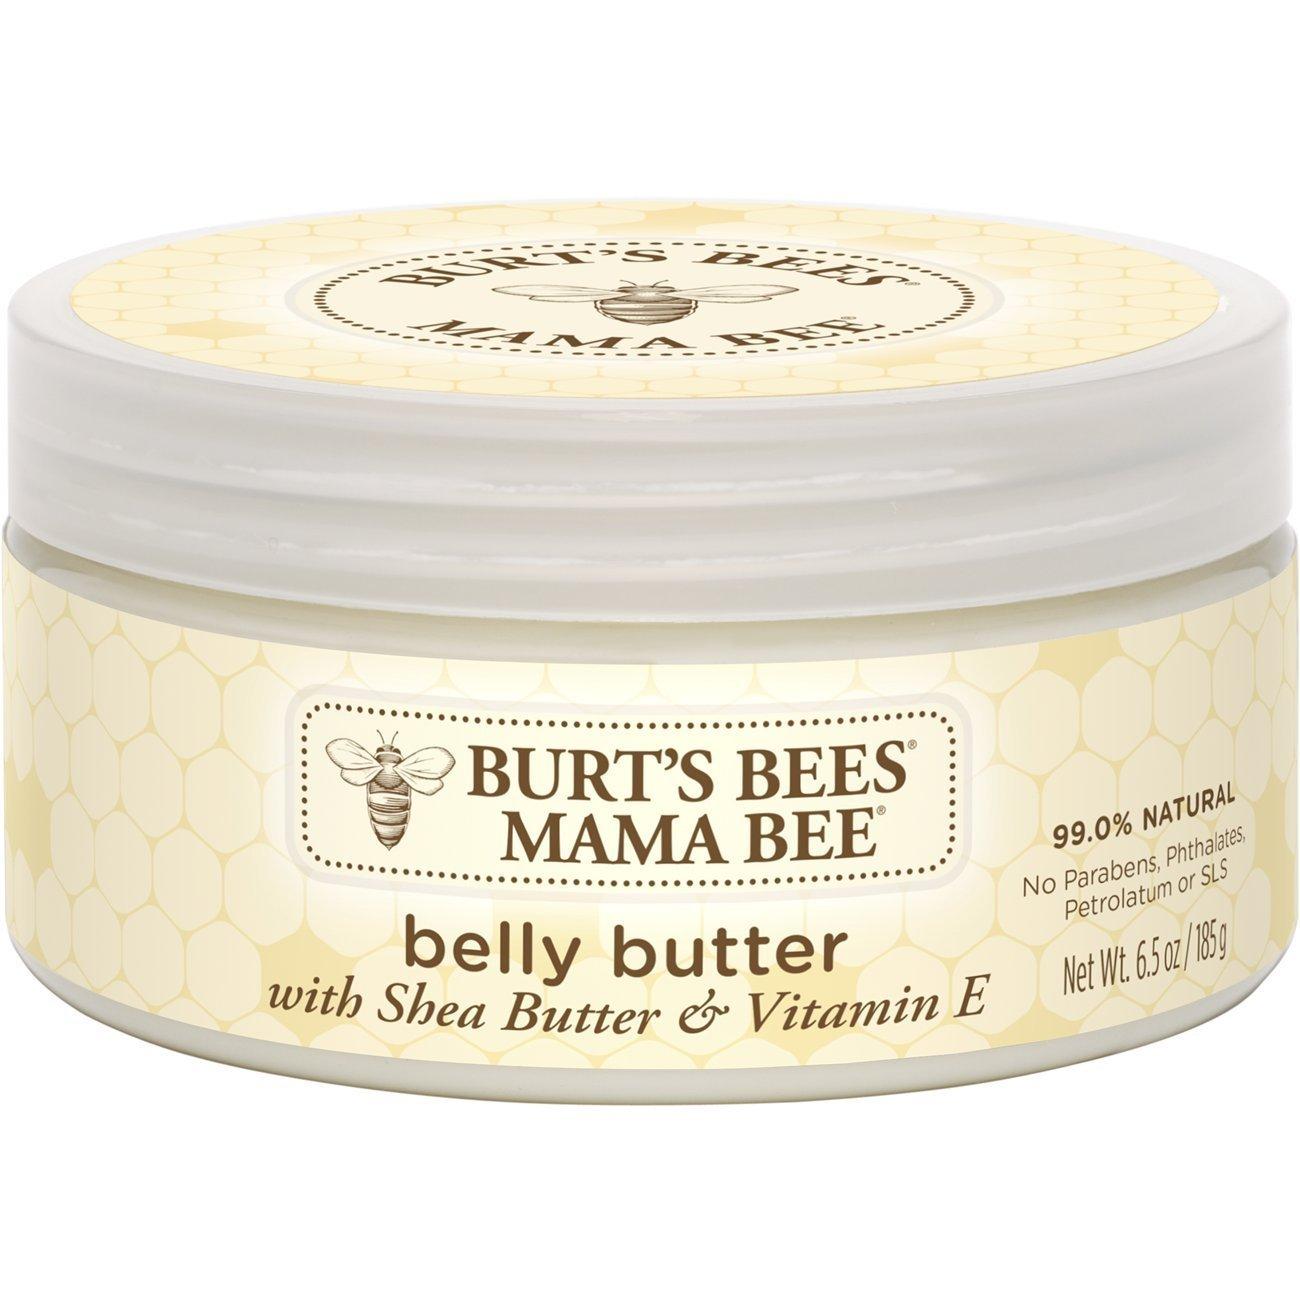 stretch belly butter remover bee mama cream mark marks body burt kenya care